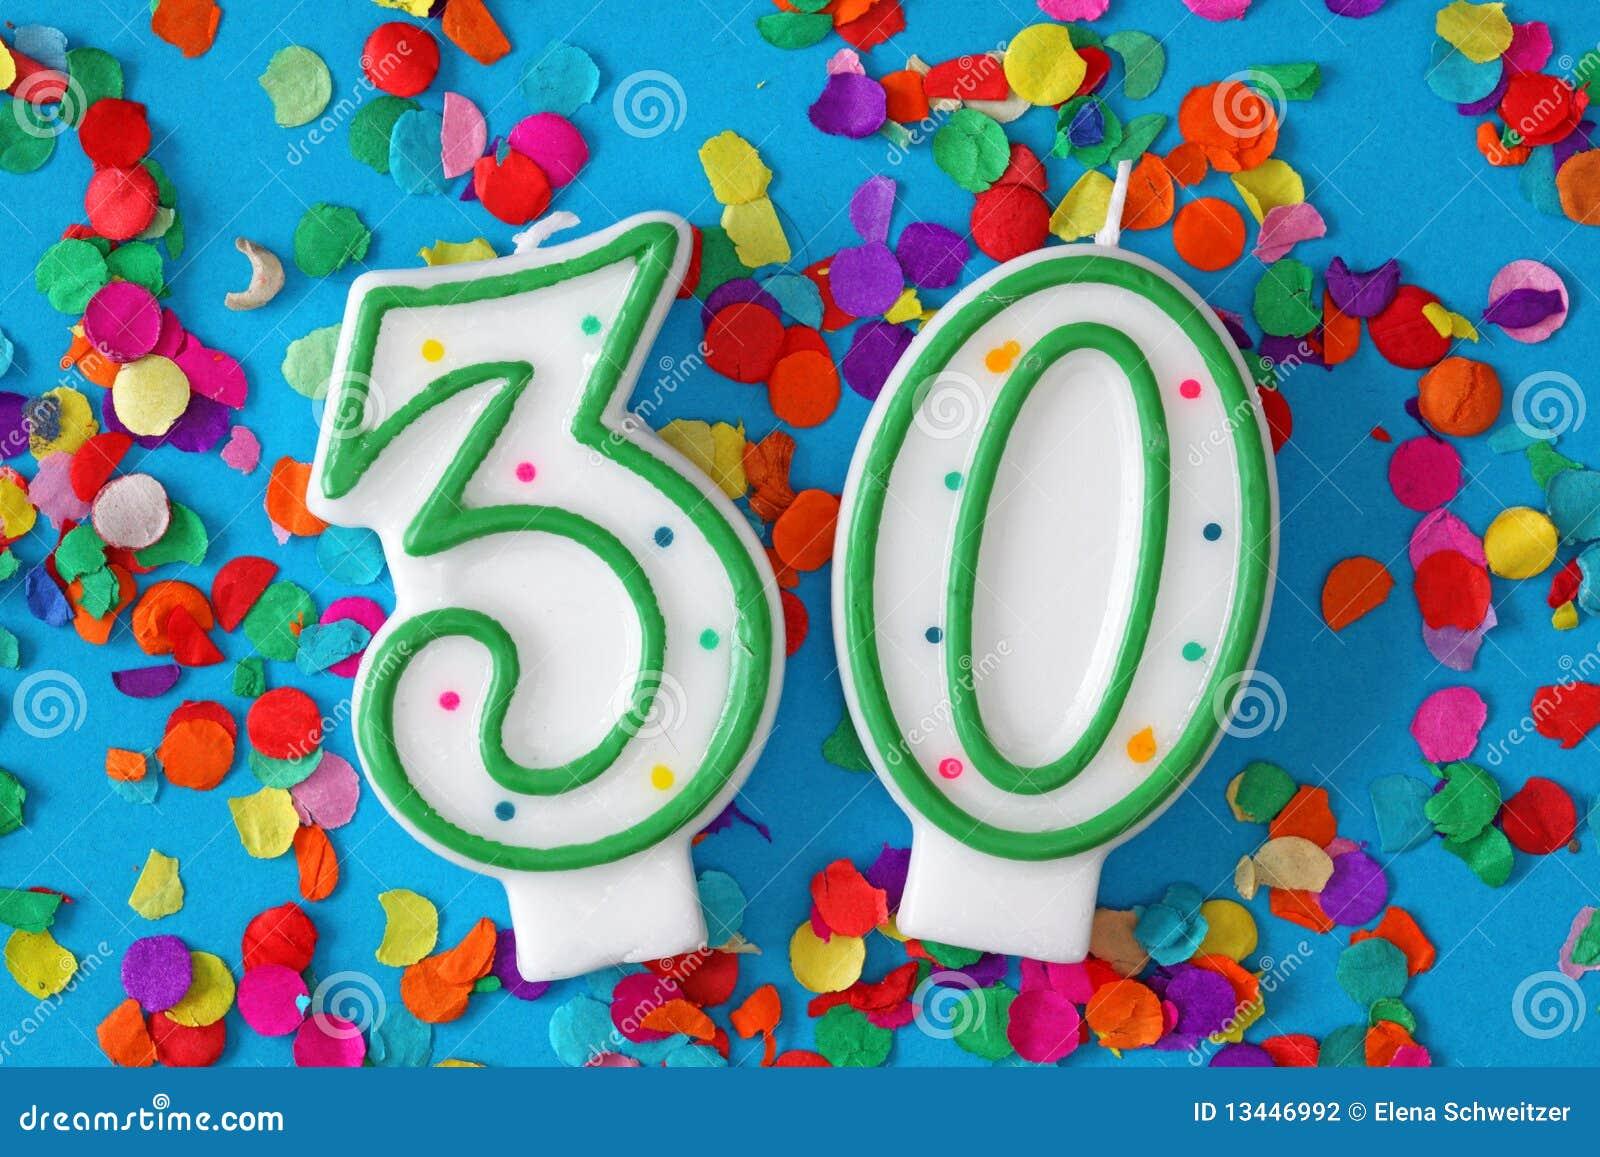 Número vela de trinta aniversários